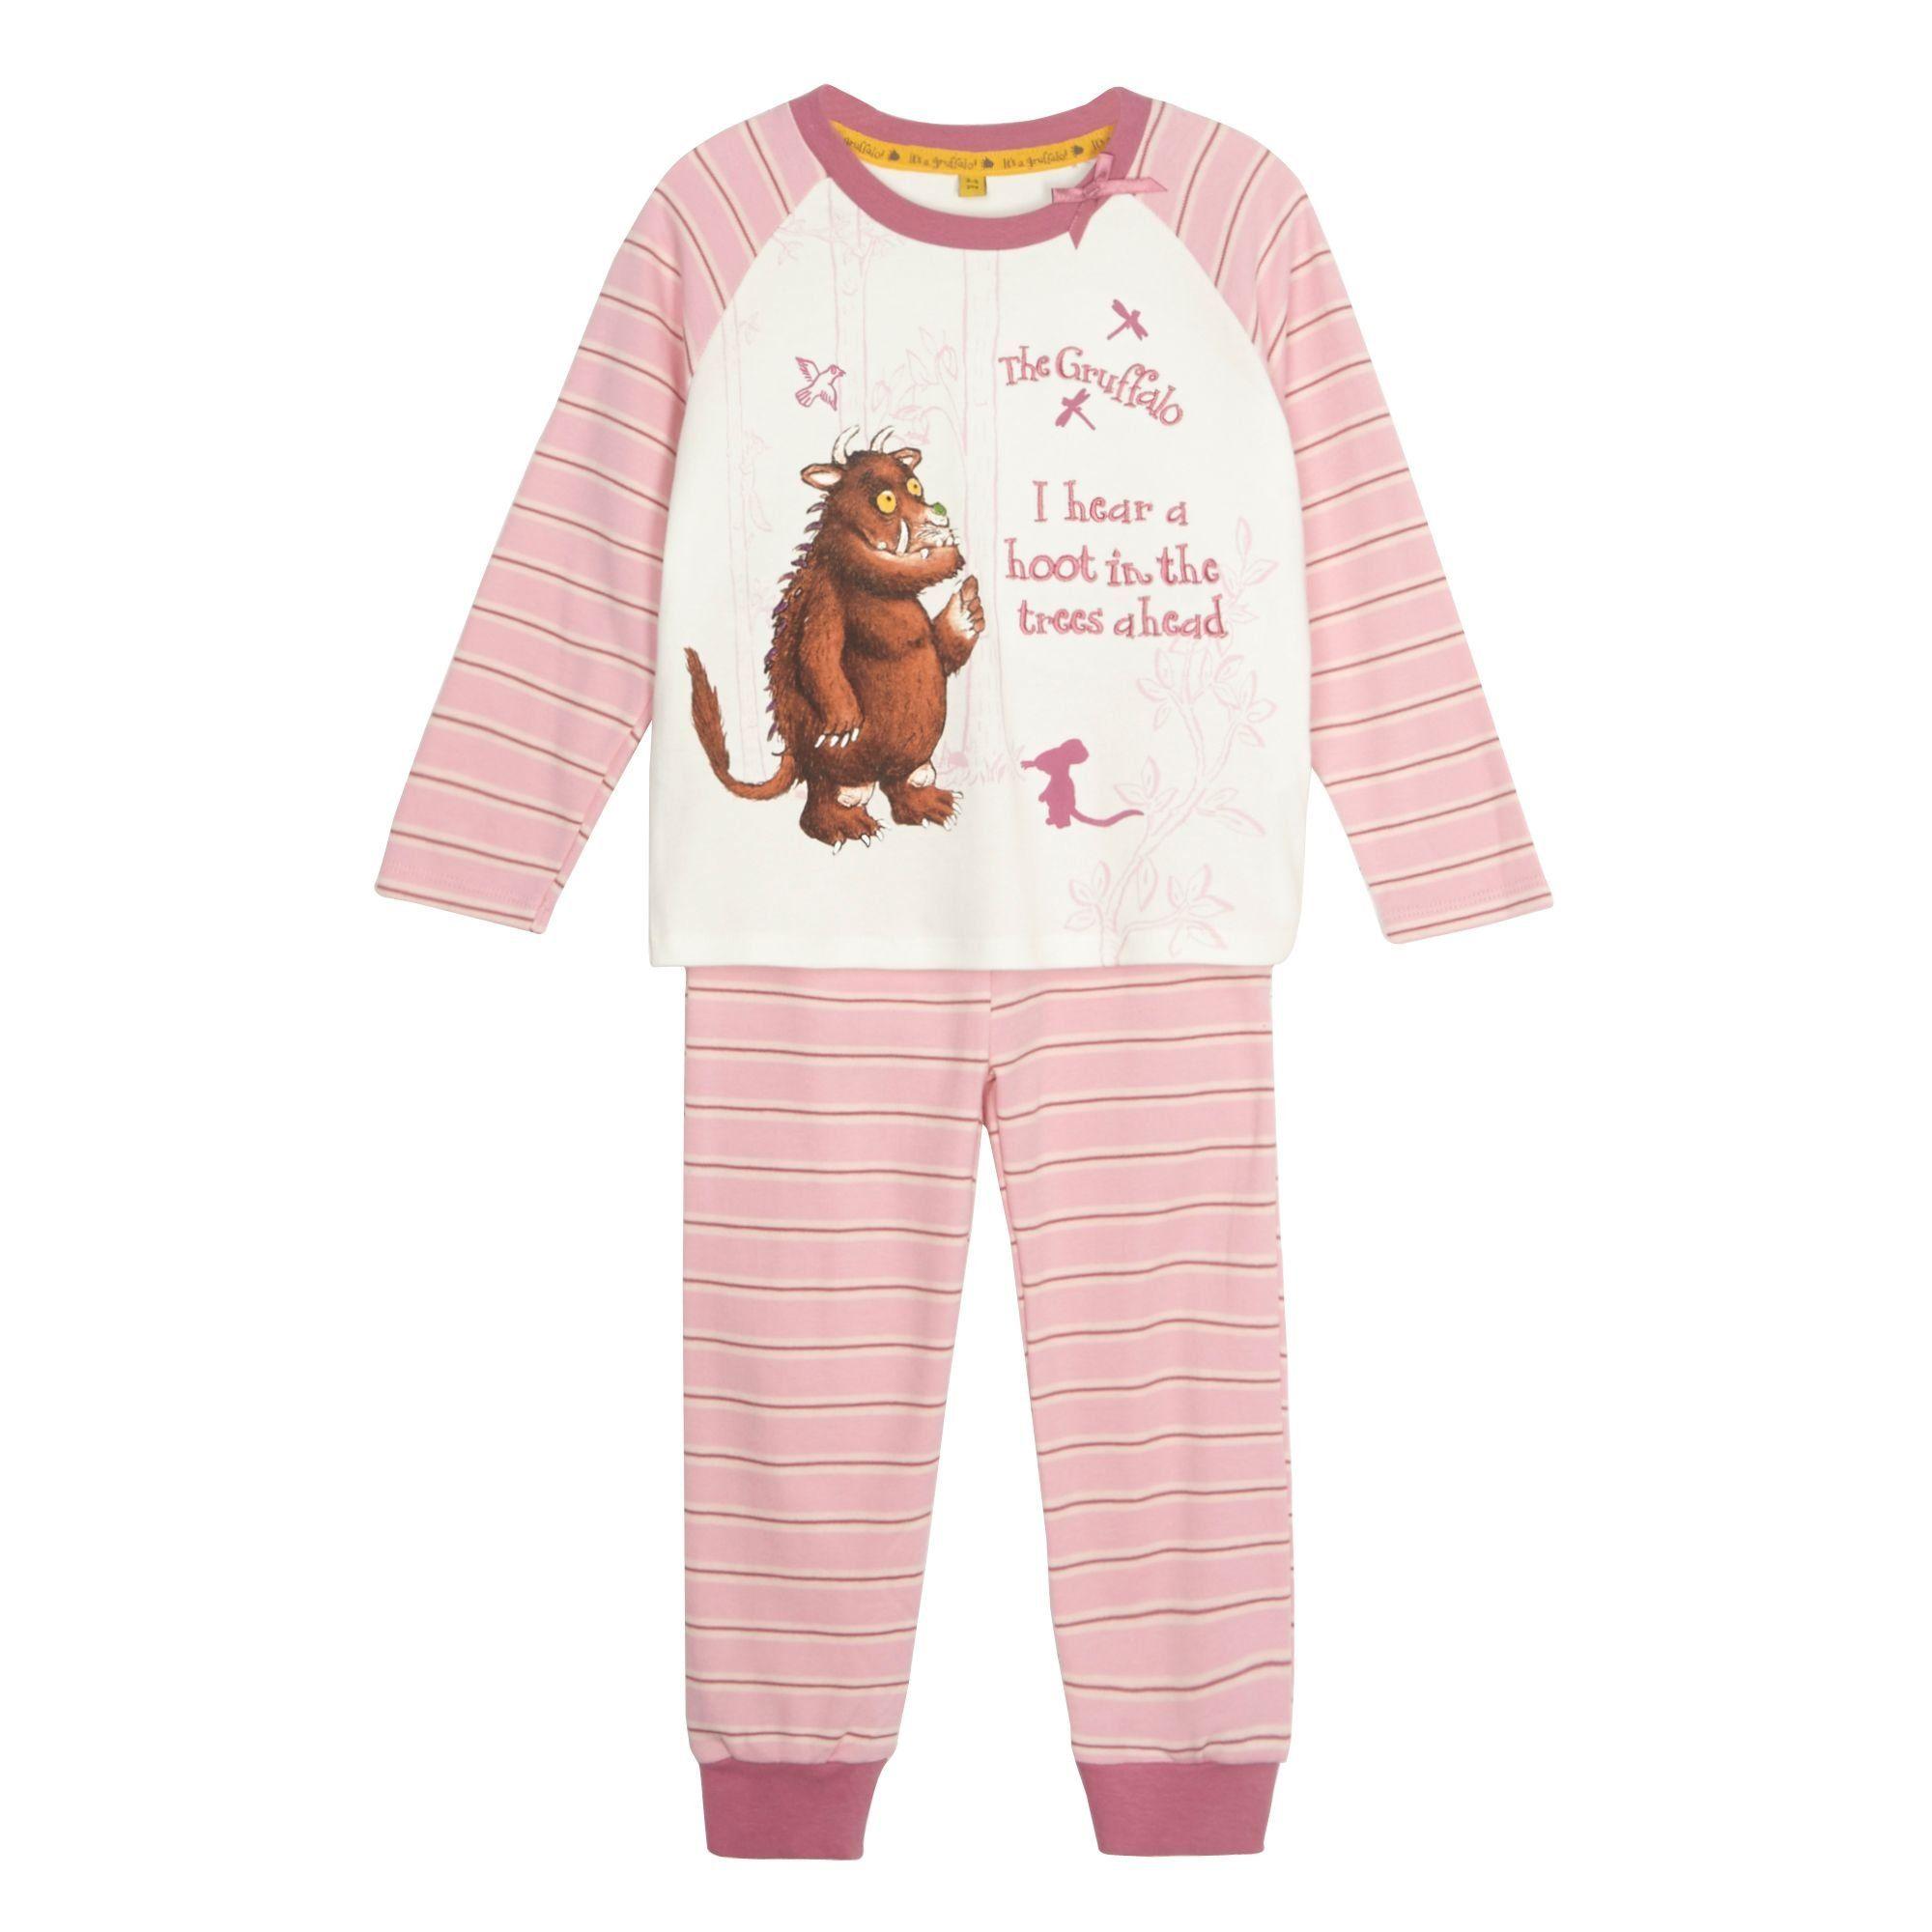 White apron sainsburys - The Gruffalo Kids Girl S Pink Gruffalo Pyjama Set The Gruffalo Amazon